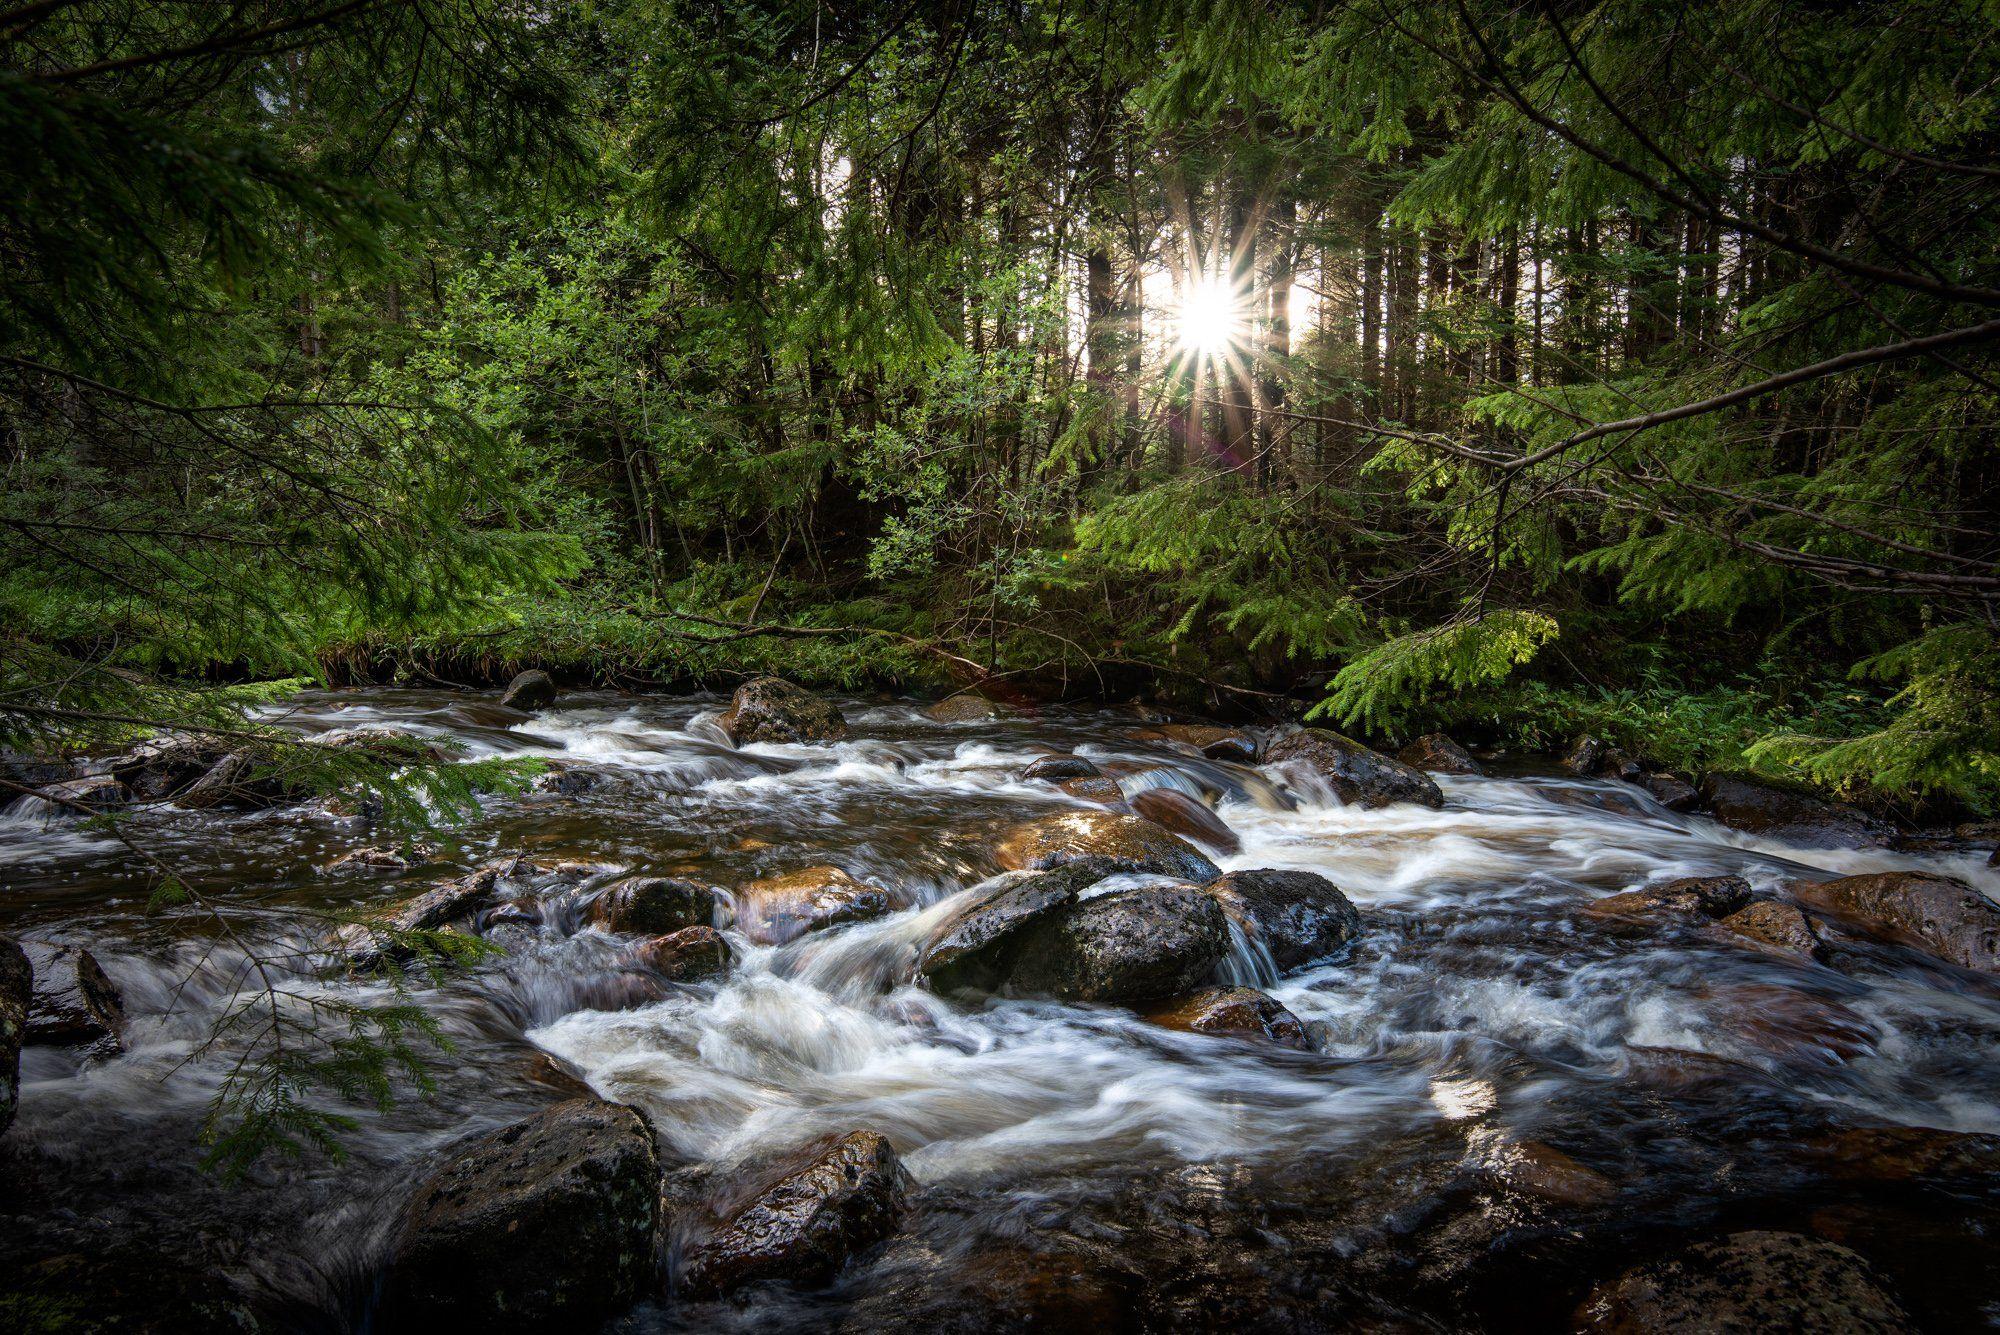 nisi filters, landscape, long exposure, forest, river, sun, green, water, Sylwia Grabinska